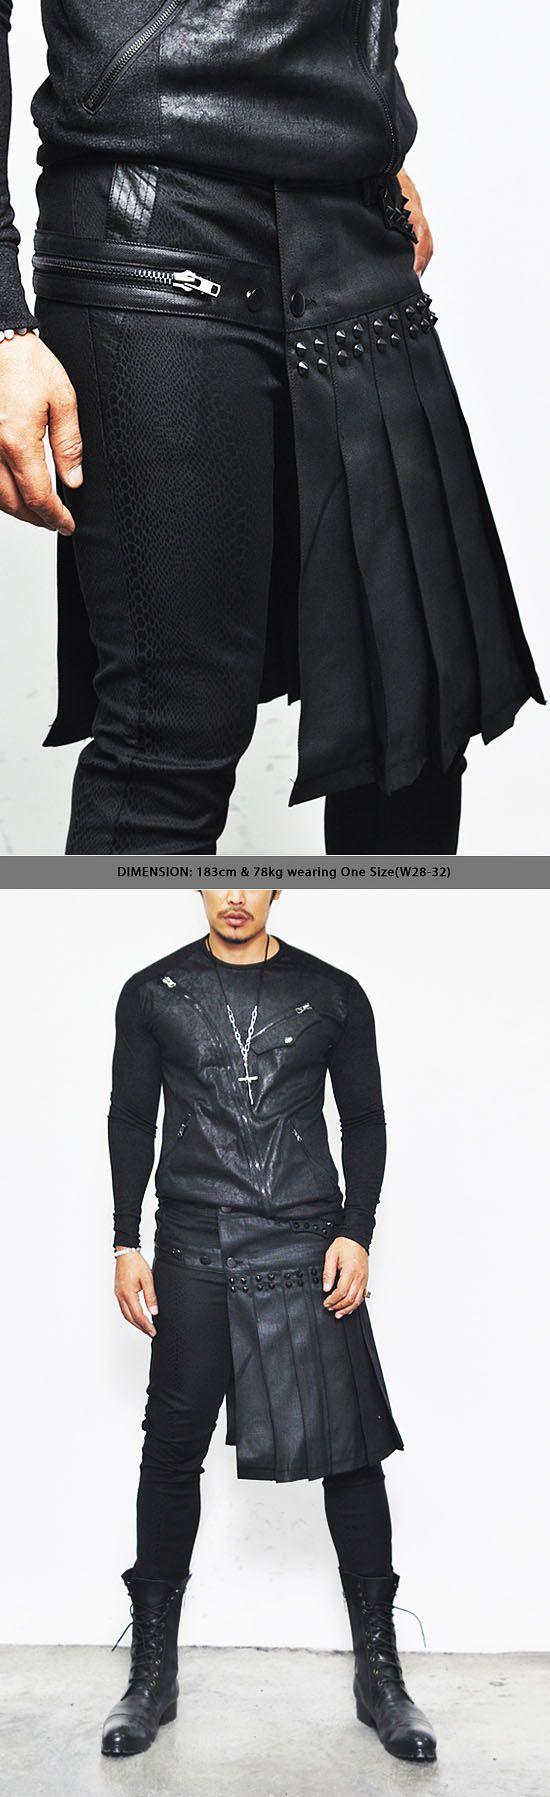 AVANT GARDE HAUTE COUTURE | Details about Avant-garde Haute Couture Mens Fleated Gladiator Wrap ...